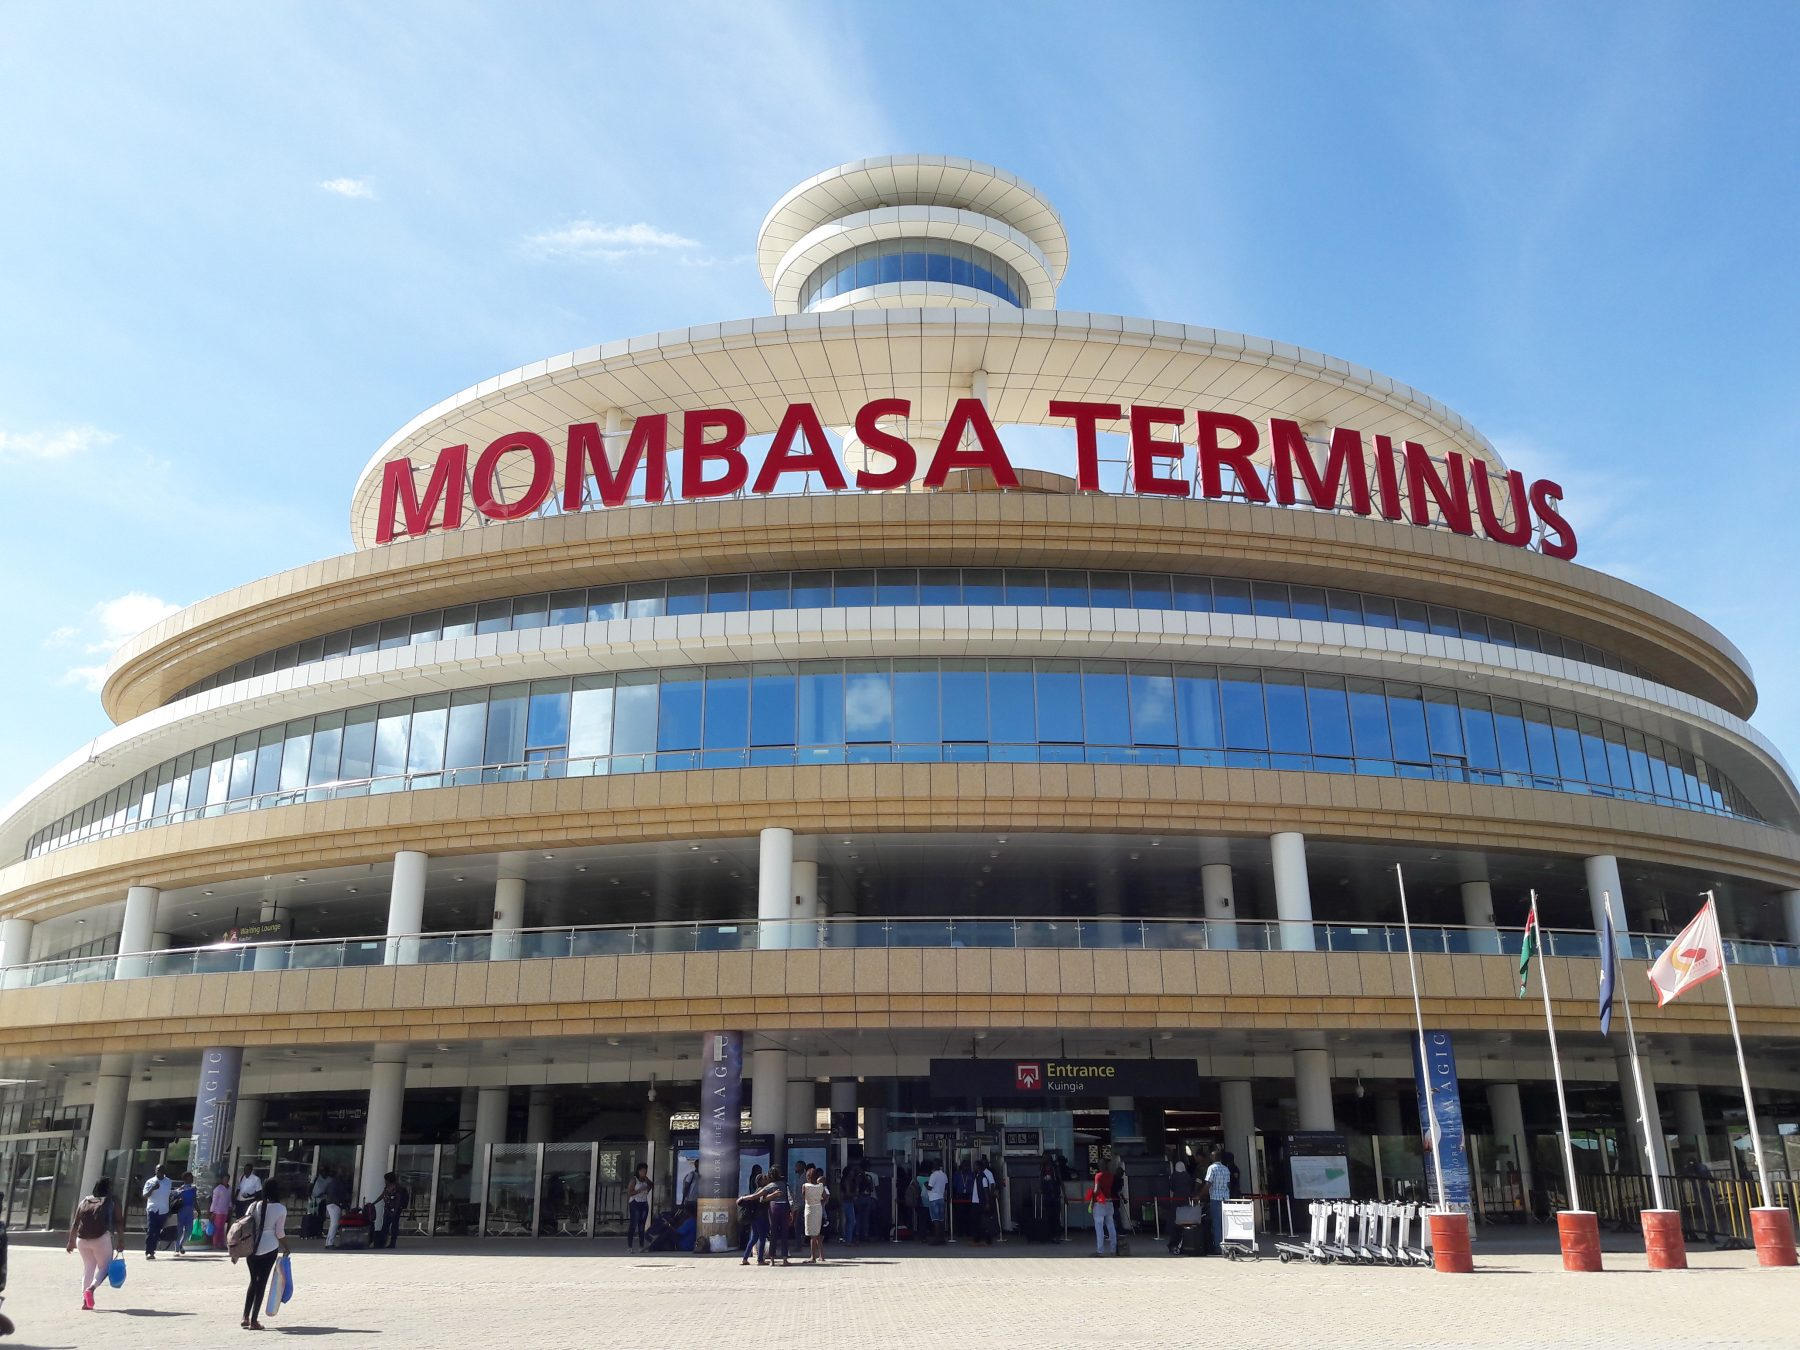 train cargo, standard gauge railway, sgr, mombasa terminus